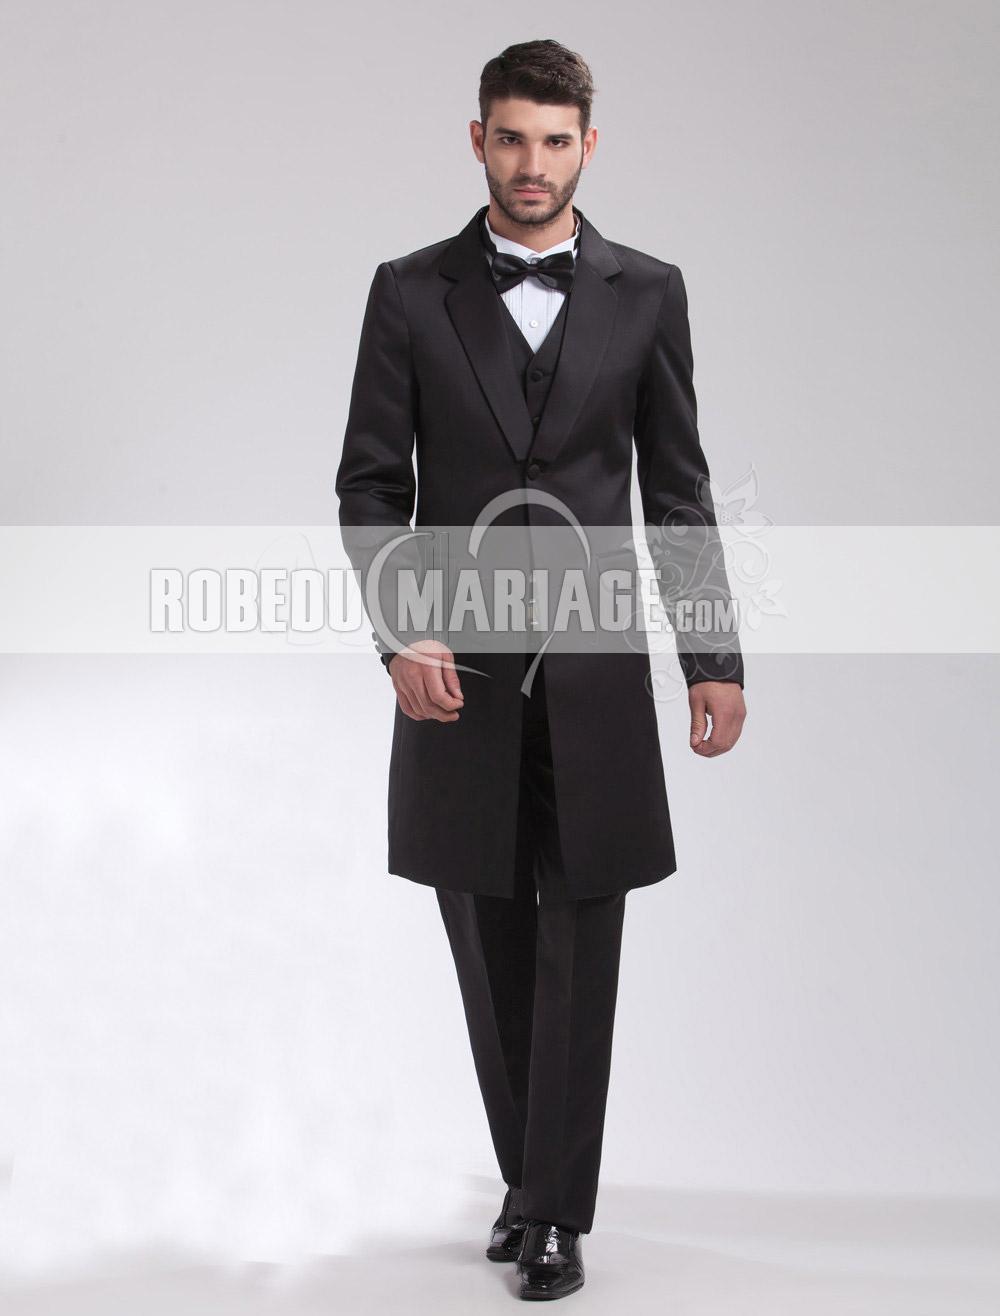 Costume De Mariage Fabuleuse Costume D Affaires Avec 4